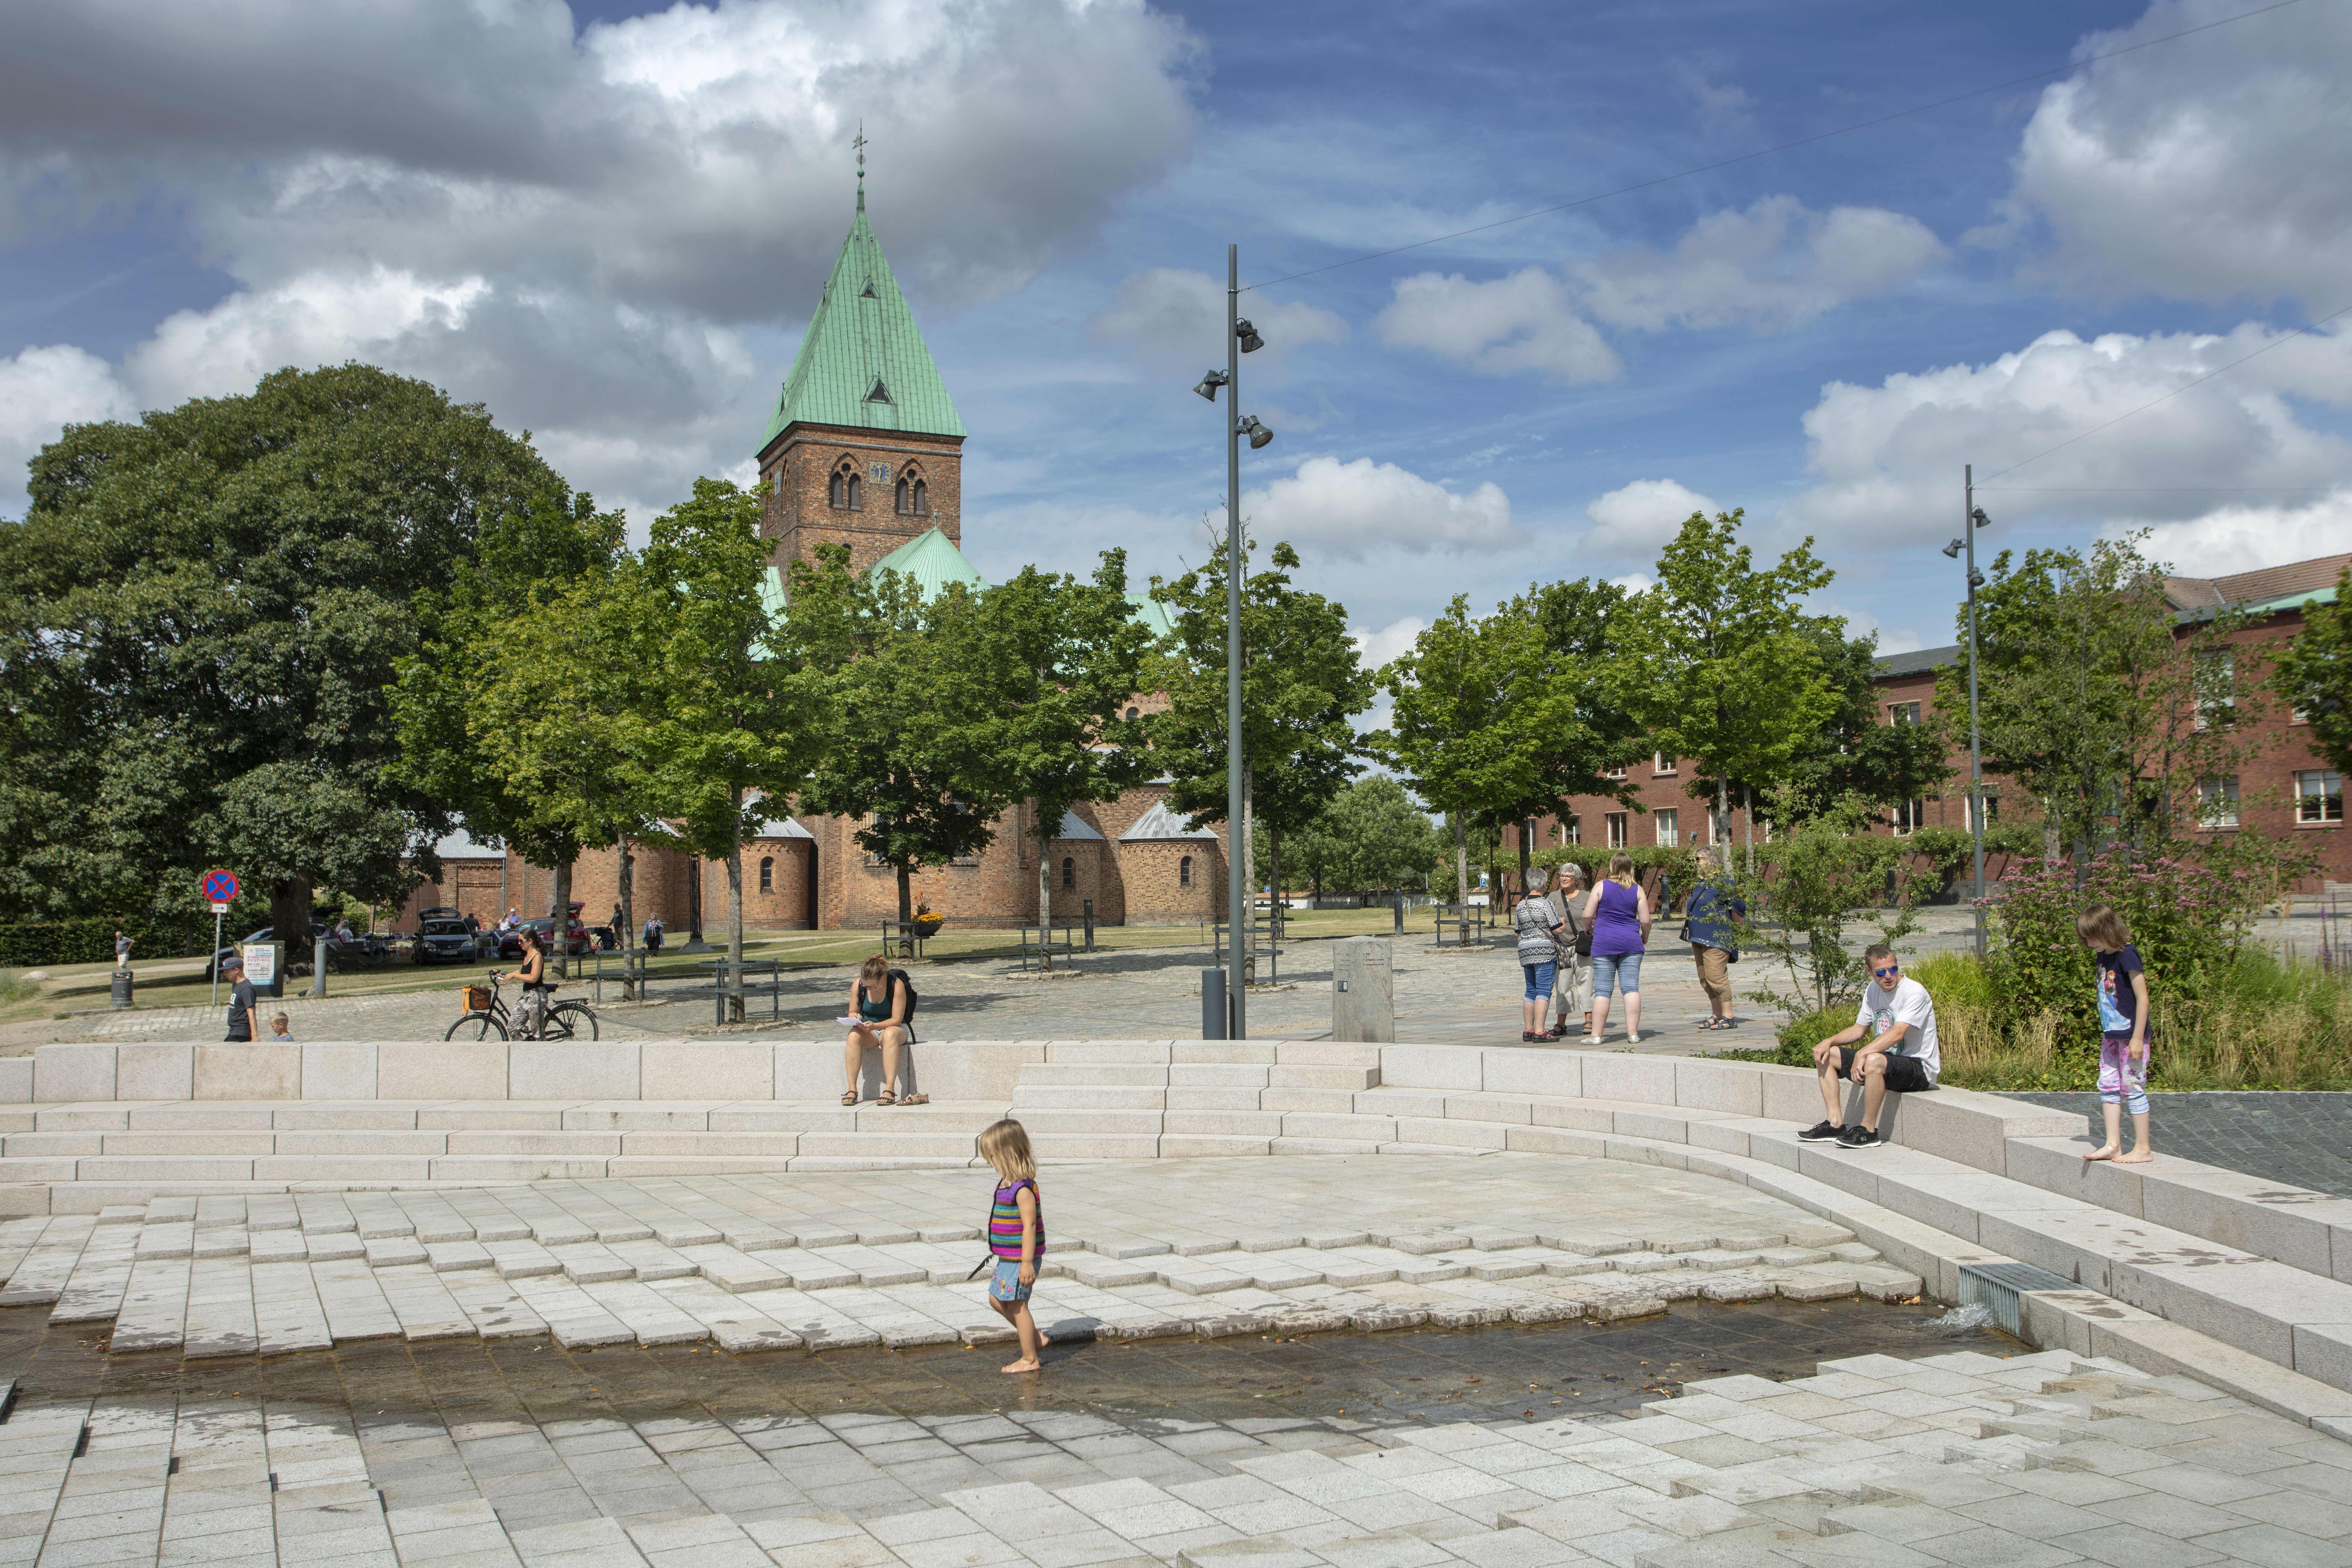 Hyggelig stemning på Torvet i Ringsted, med Sct. Bendts Kirke i baggrunden